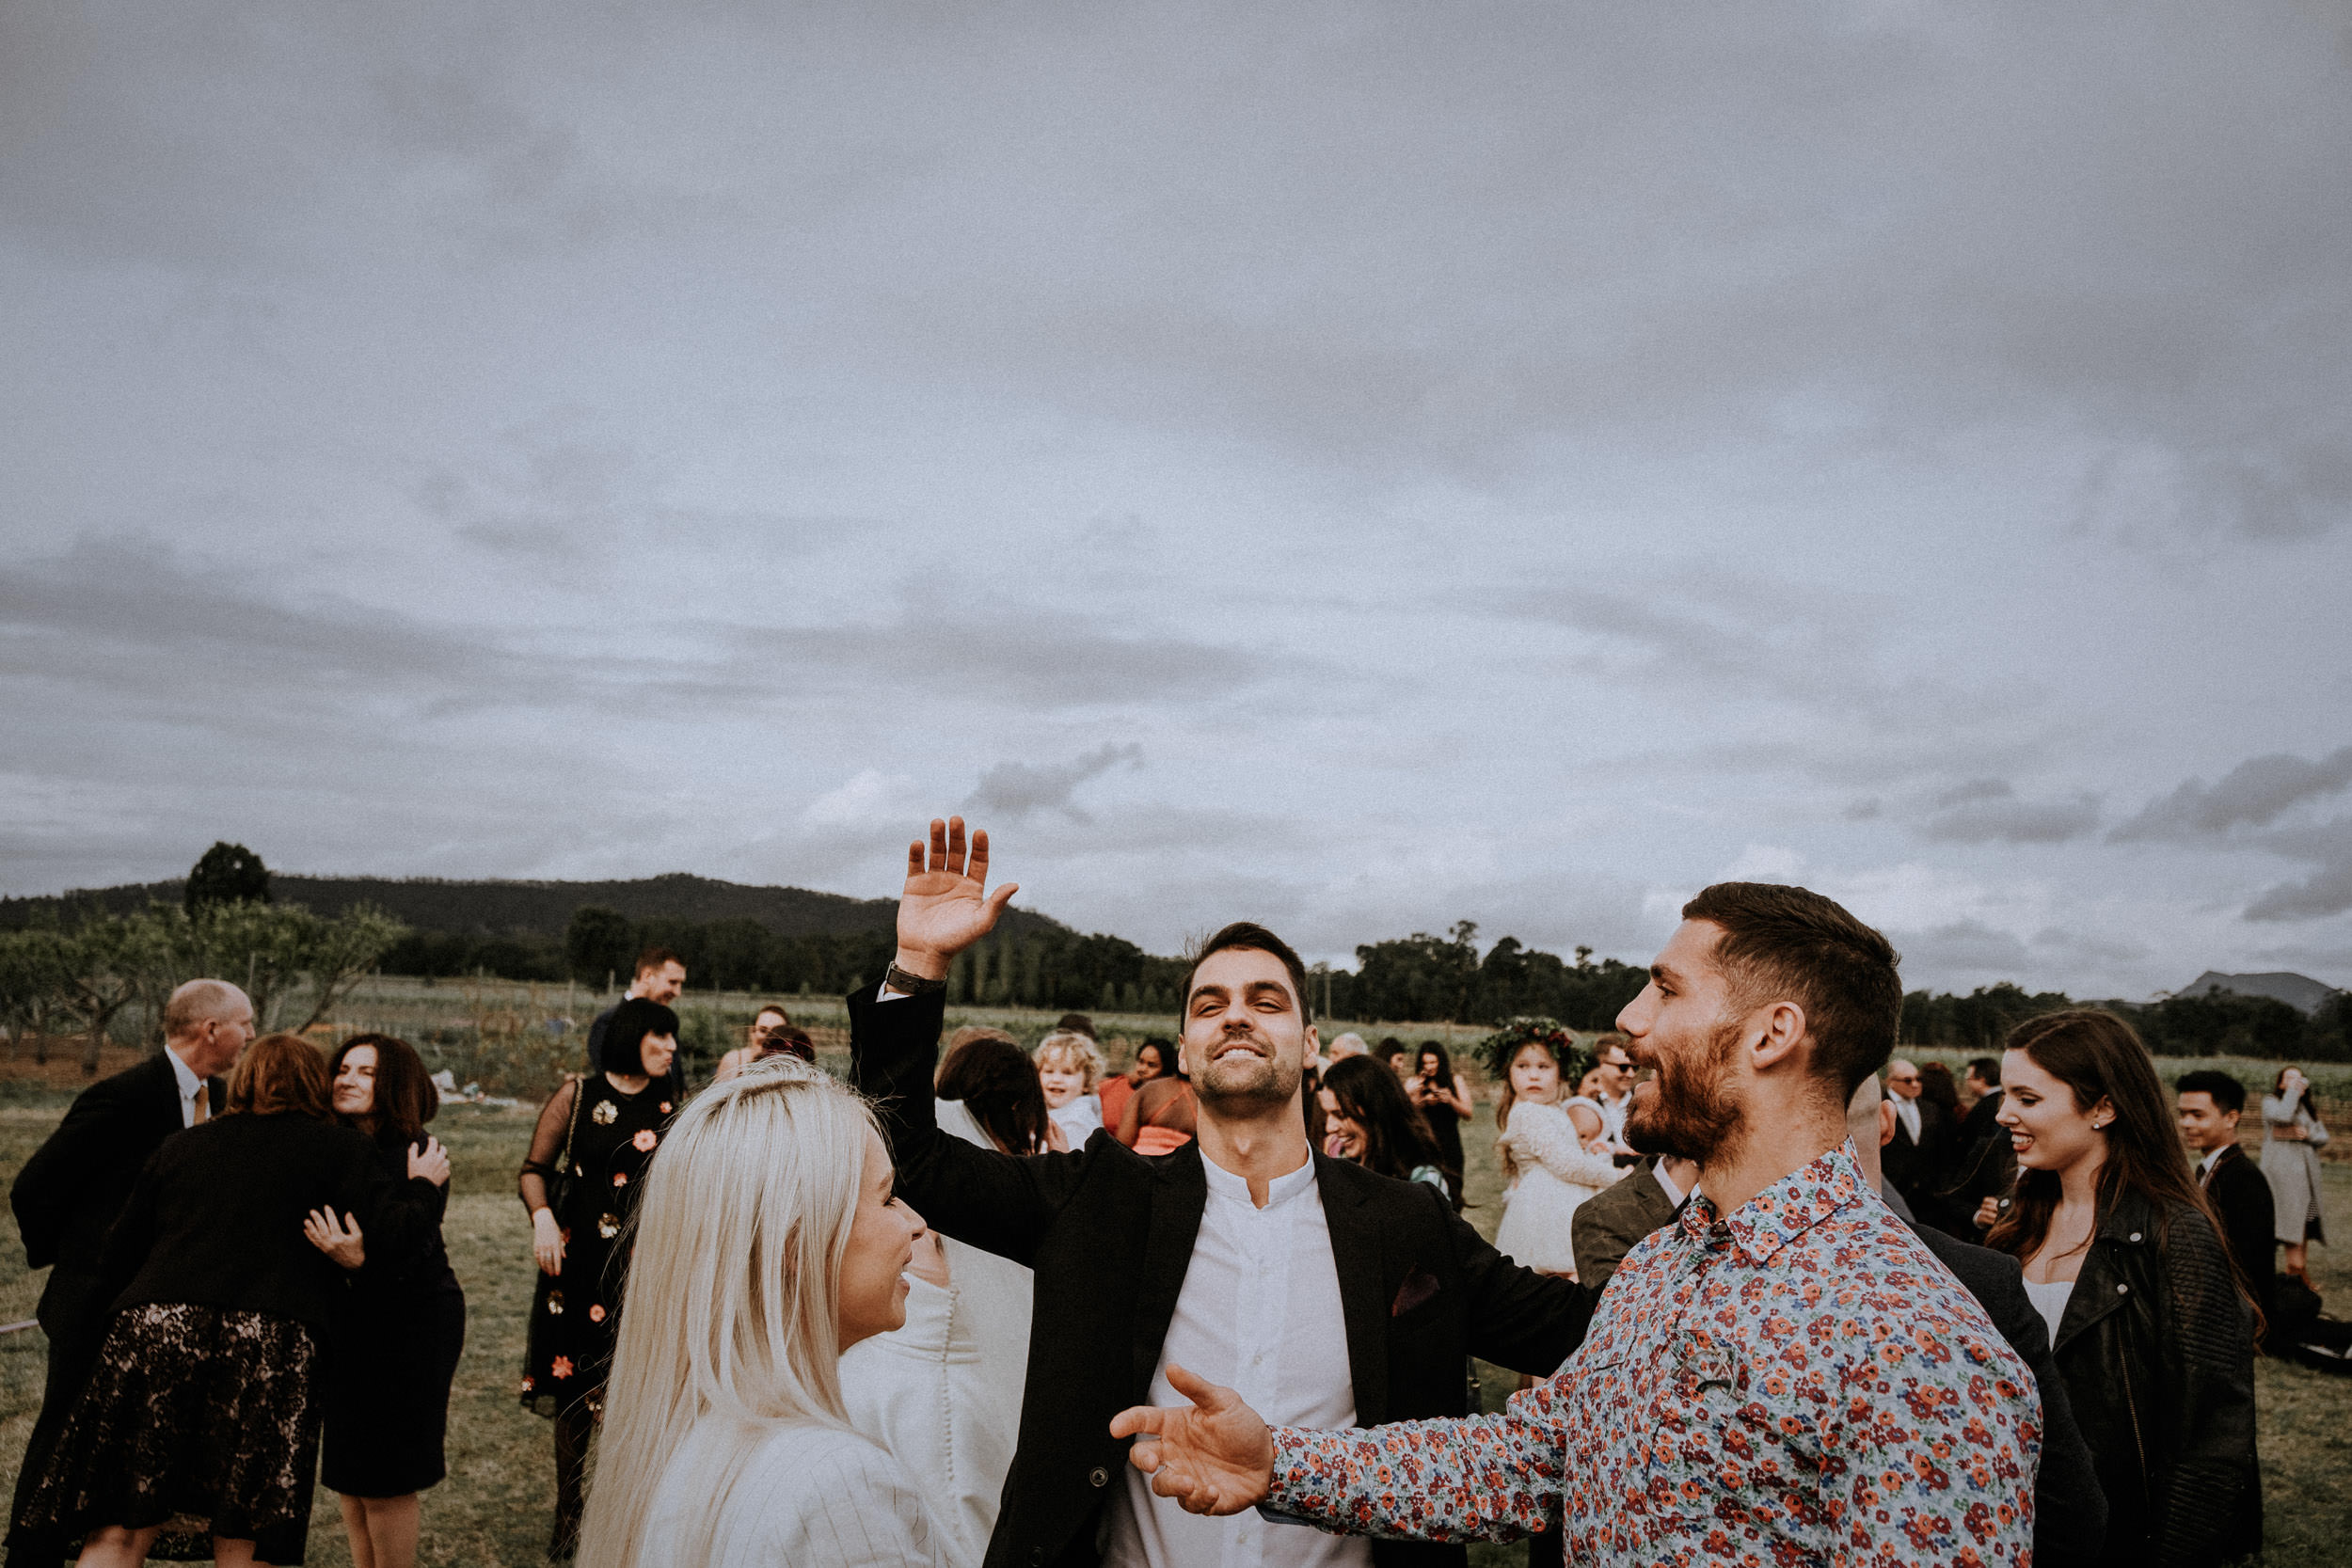 s+j_top_elopement wedding photography_kings & thieves_blog - 349.jpg